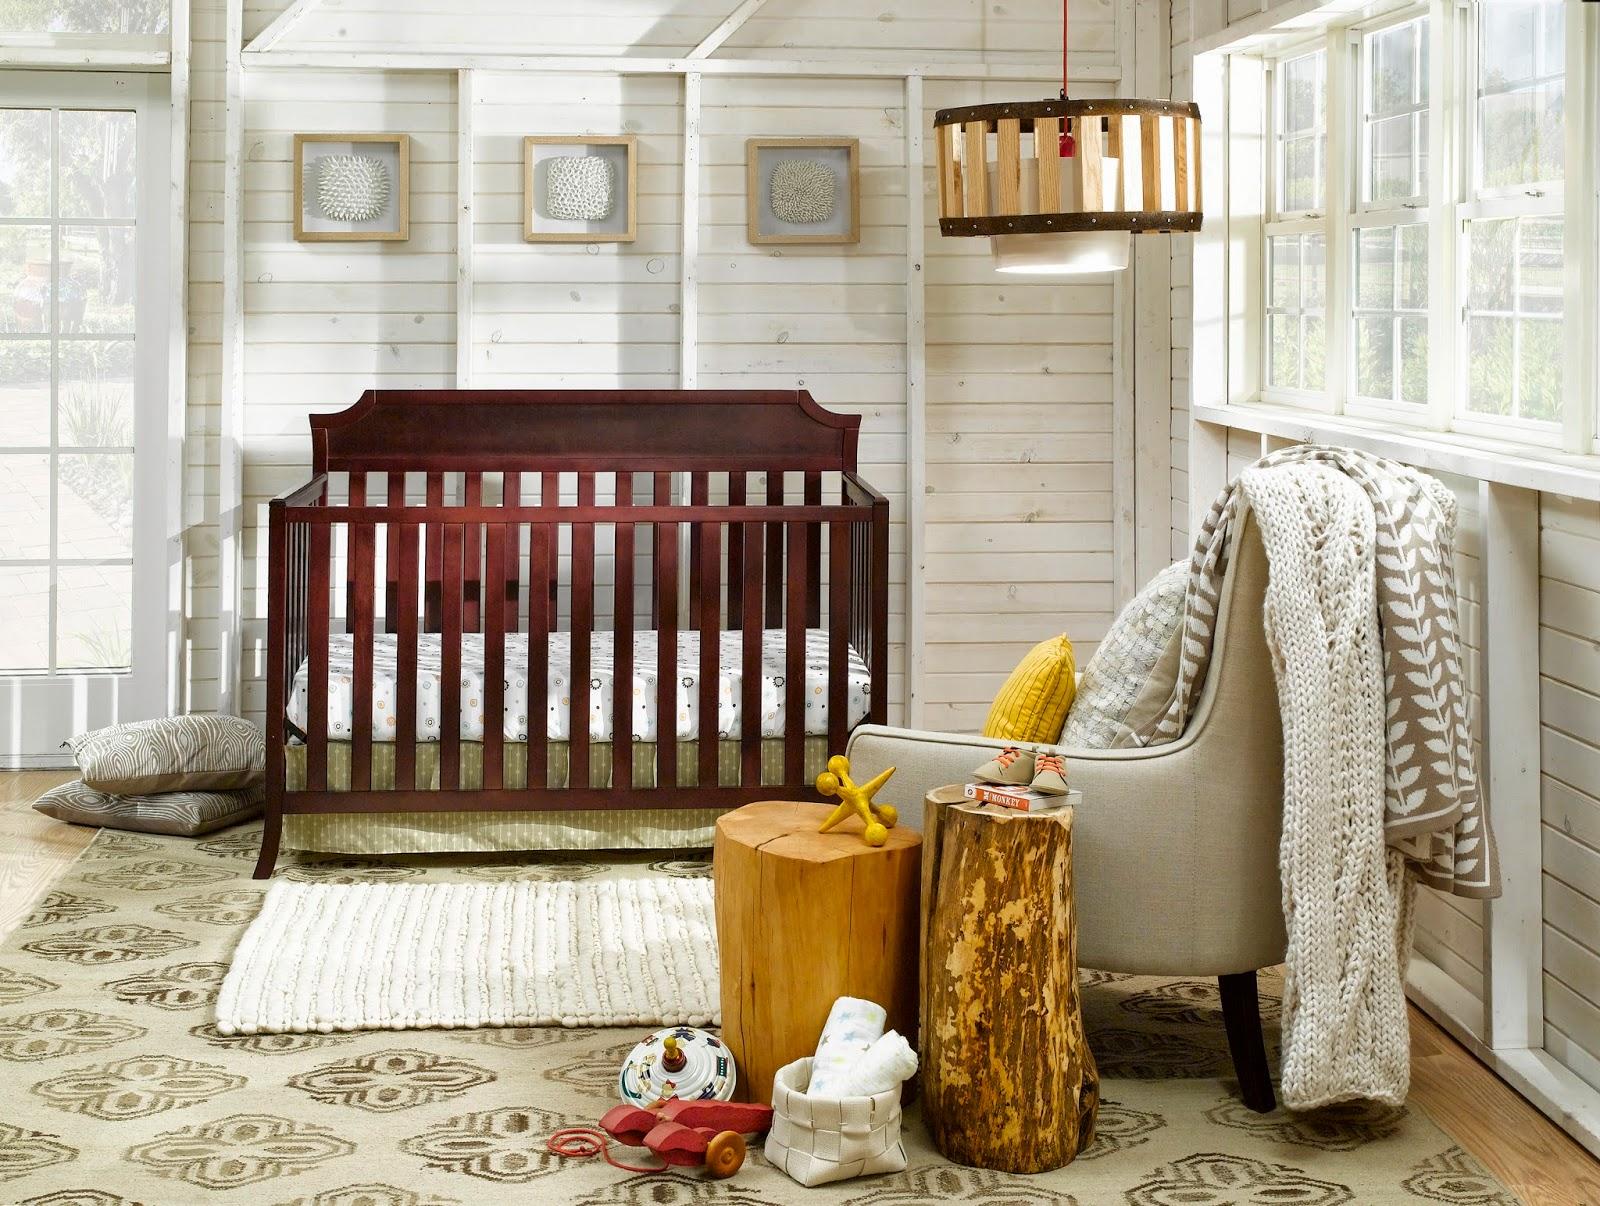 Urbini Dream Nursery Instagram Contest